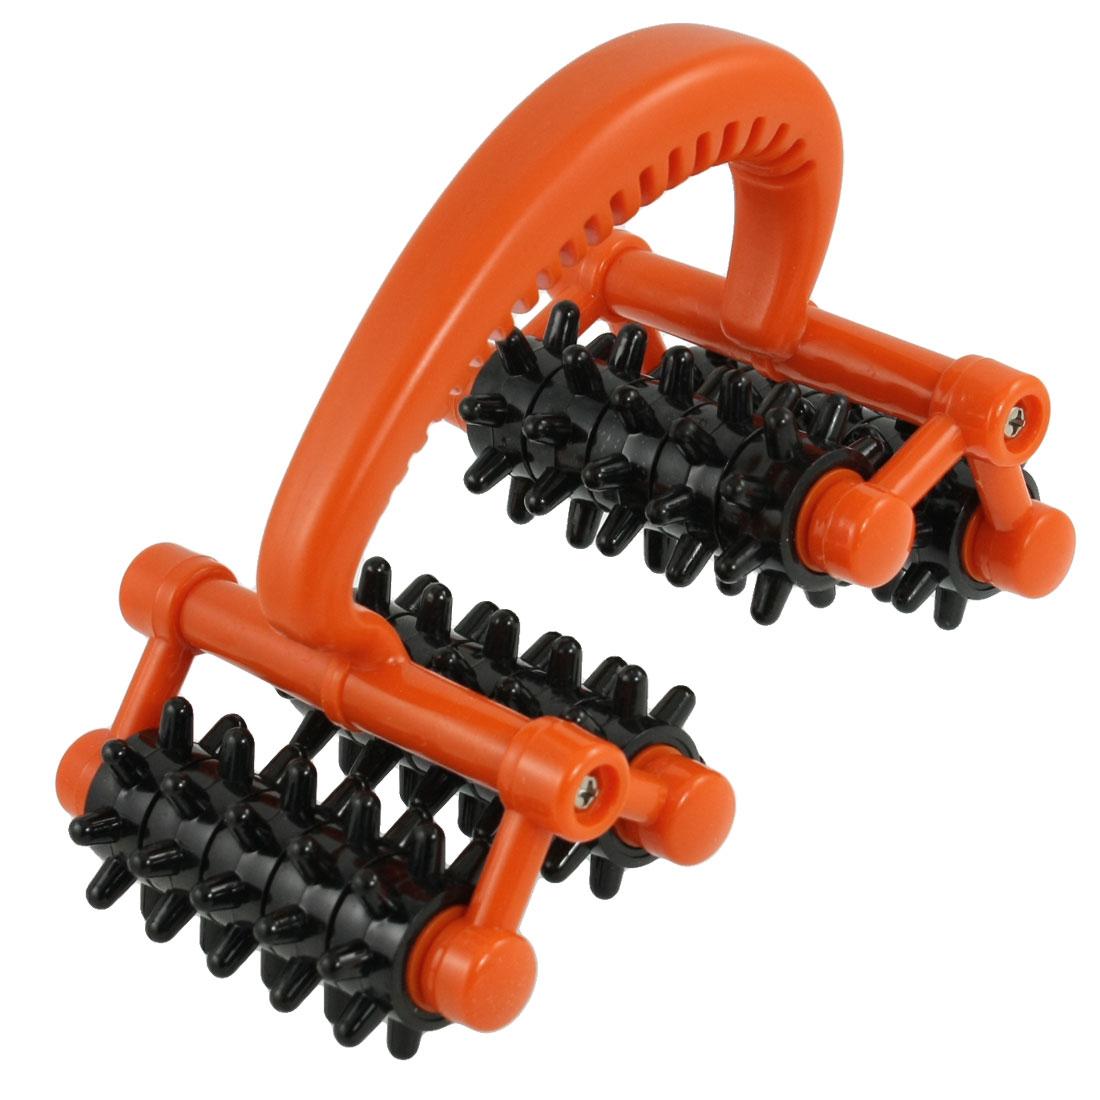 Handheld 20 Black Wheels Orange Grip Health Care Roller Massager